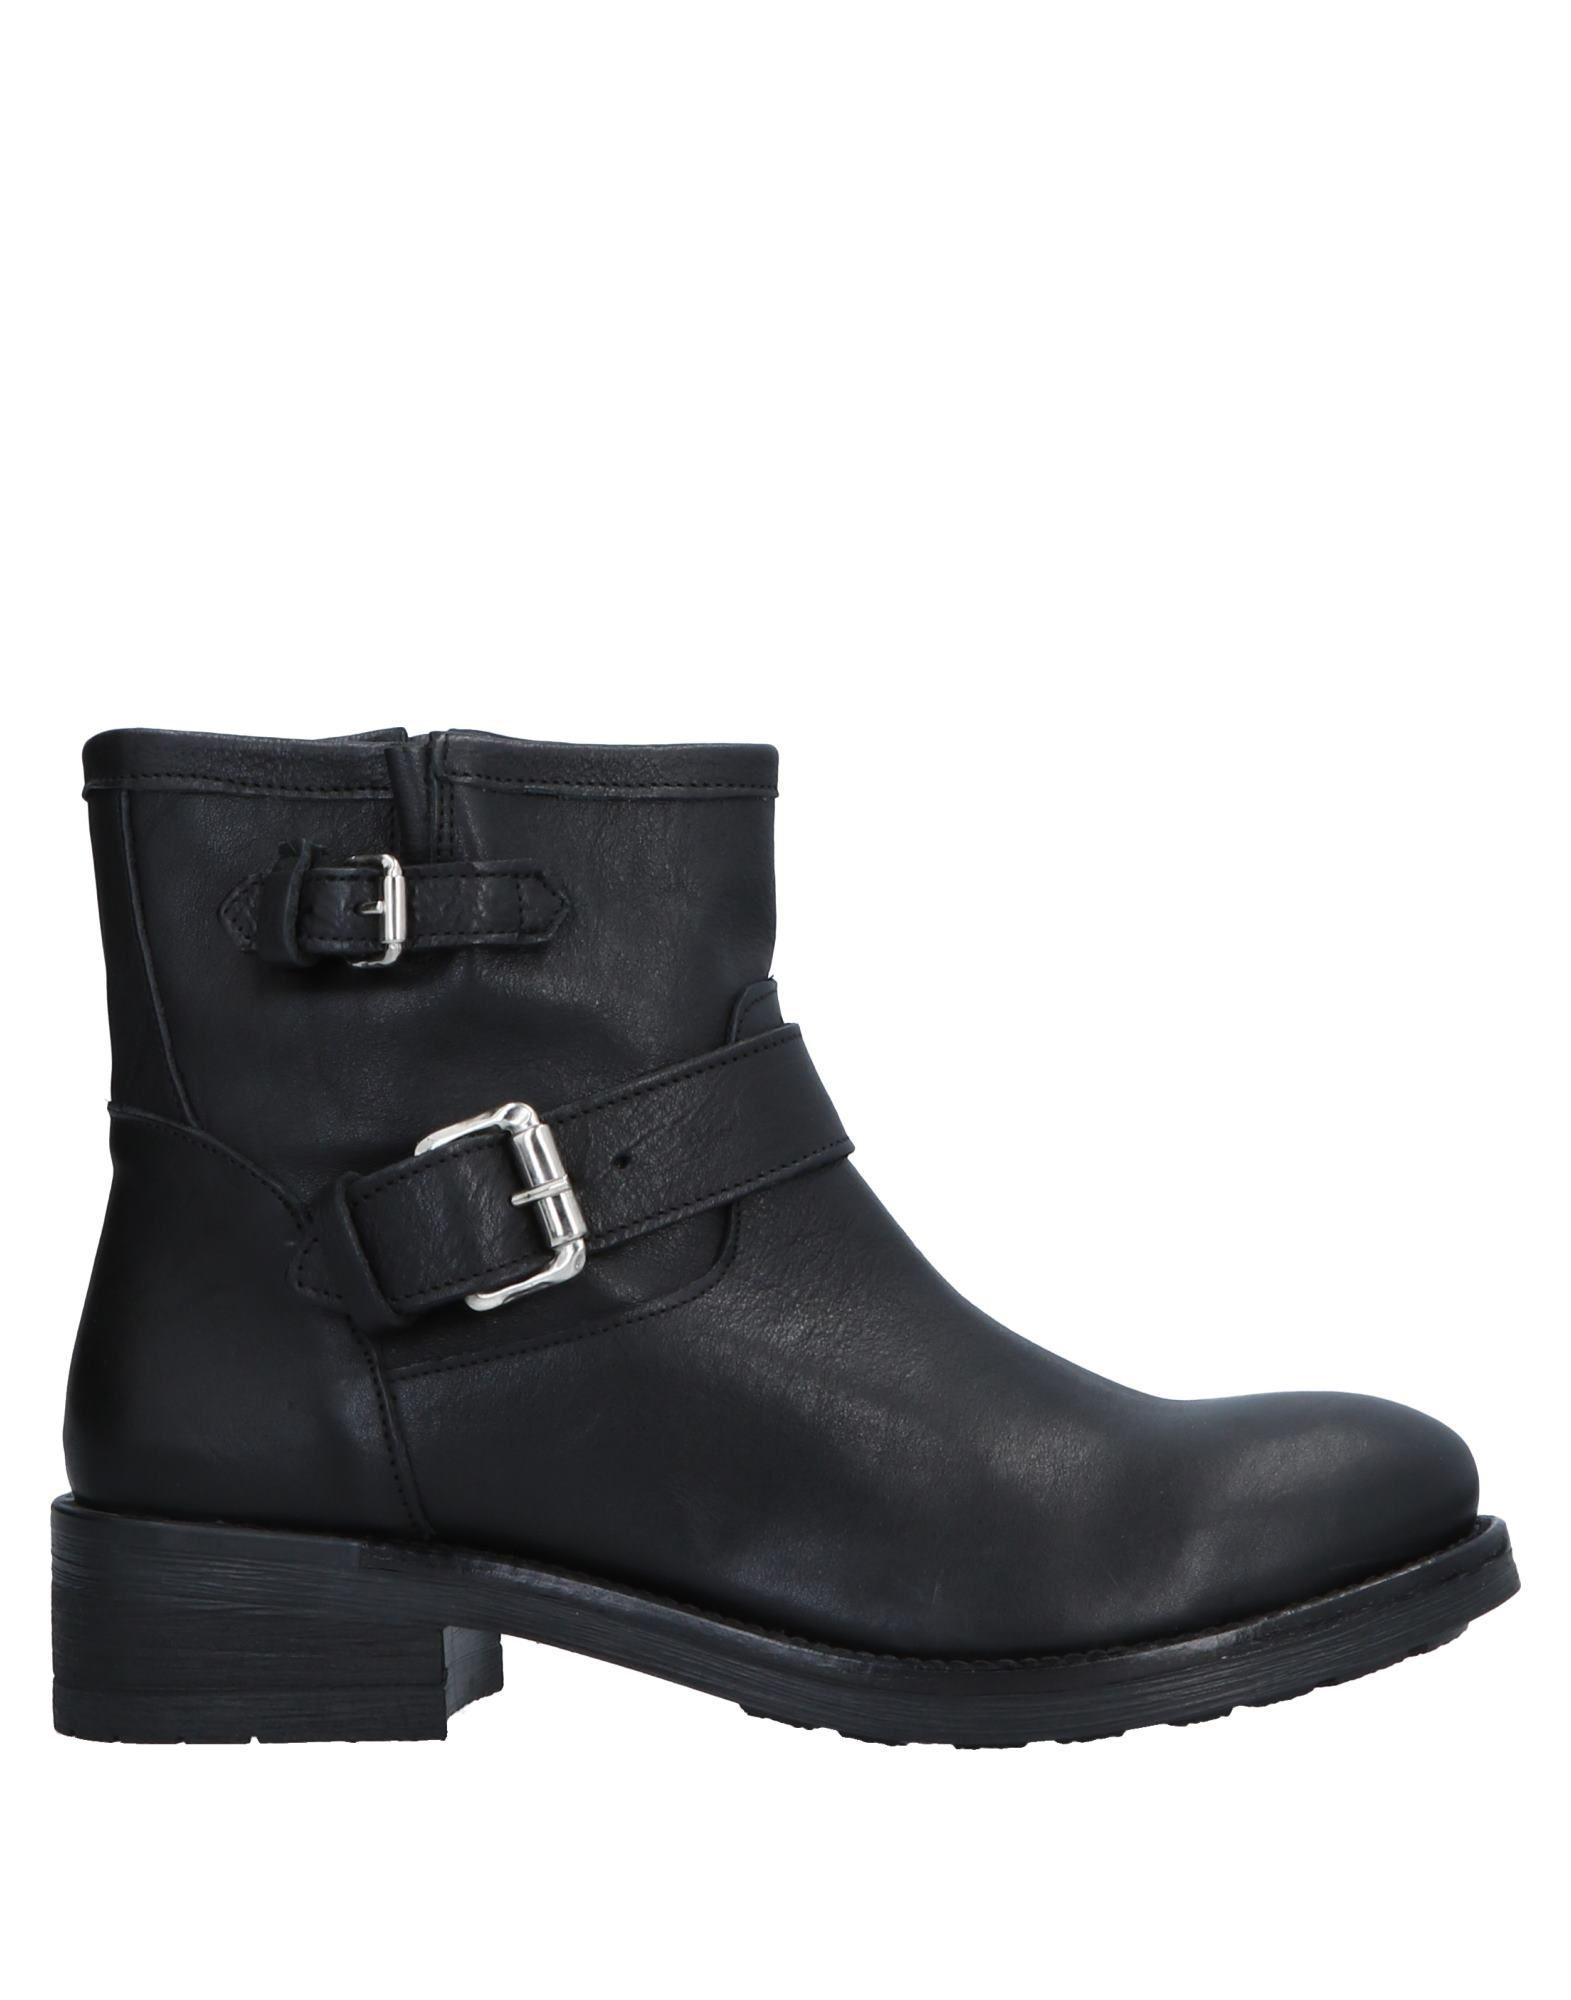 Way Out London Stiefelette Damen  11536309TC Gute Qualität beliebte Schuhe